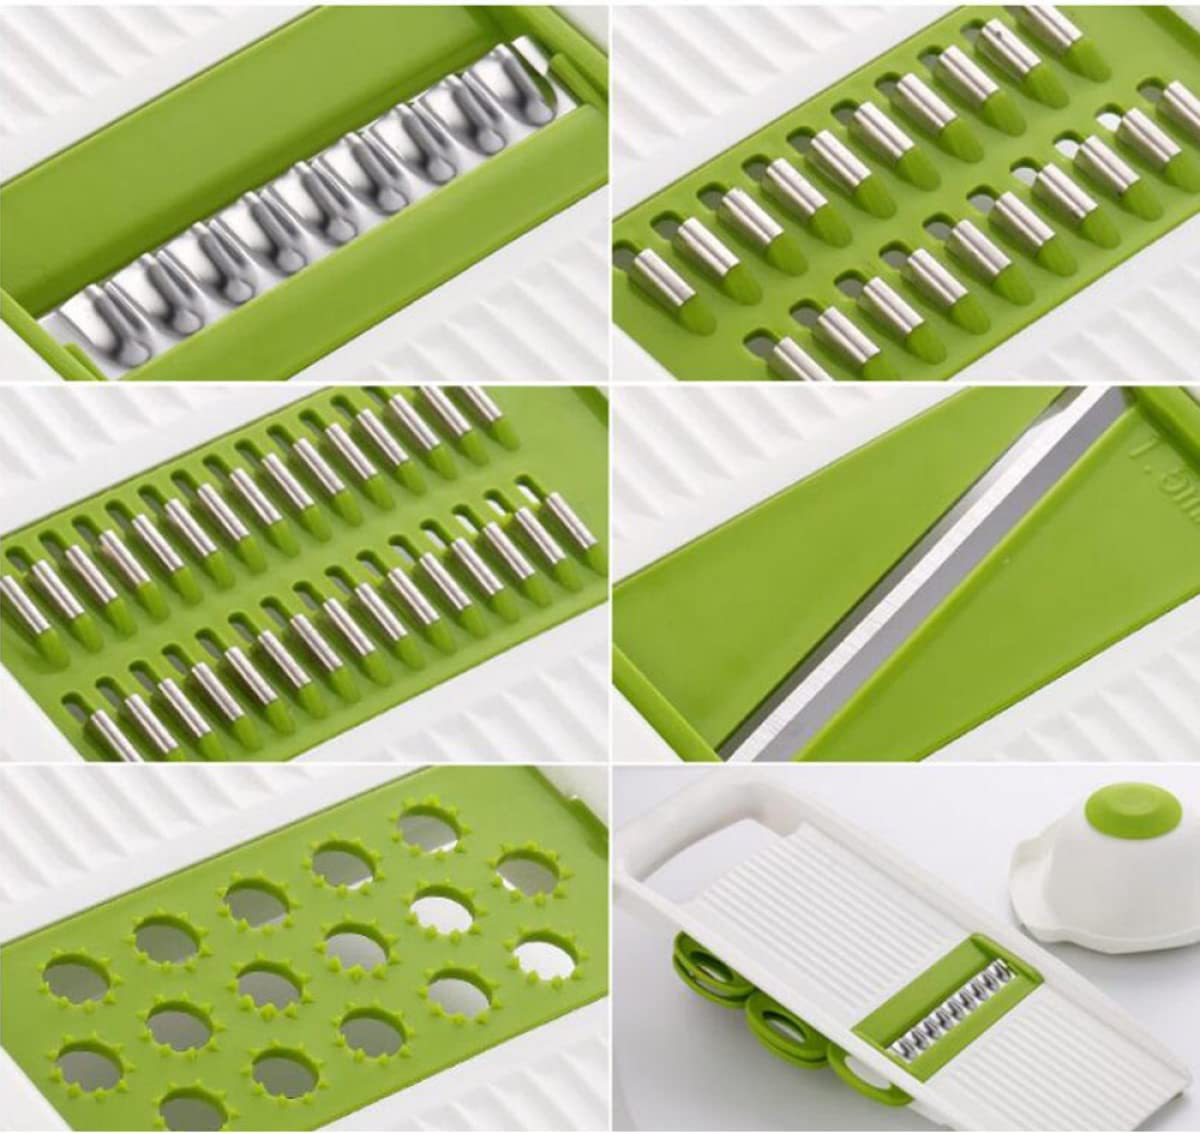 ZAIYI Slicer by Wipes Multifunctional Shredder Menaje De Cocina Potato Shredded Home Slicer Grater Manual,Green Green